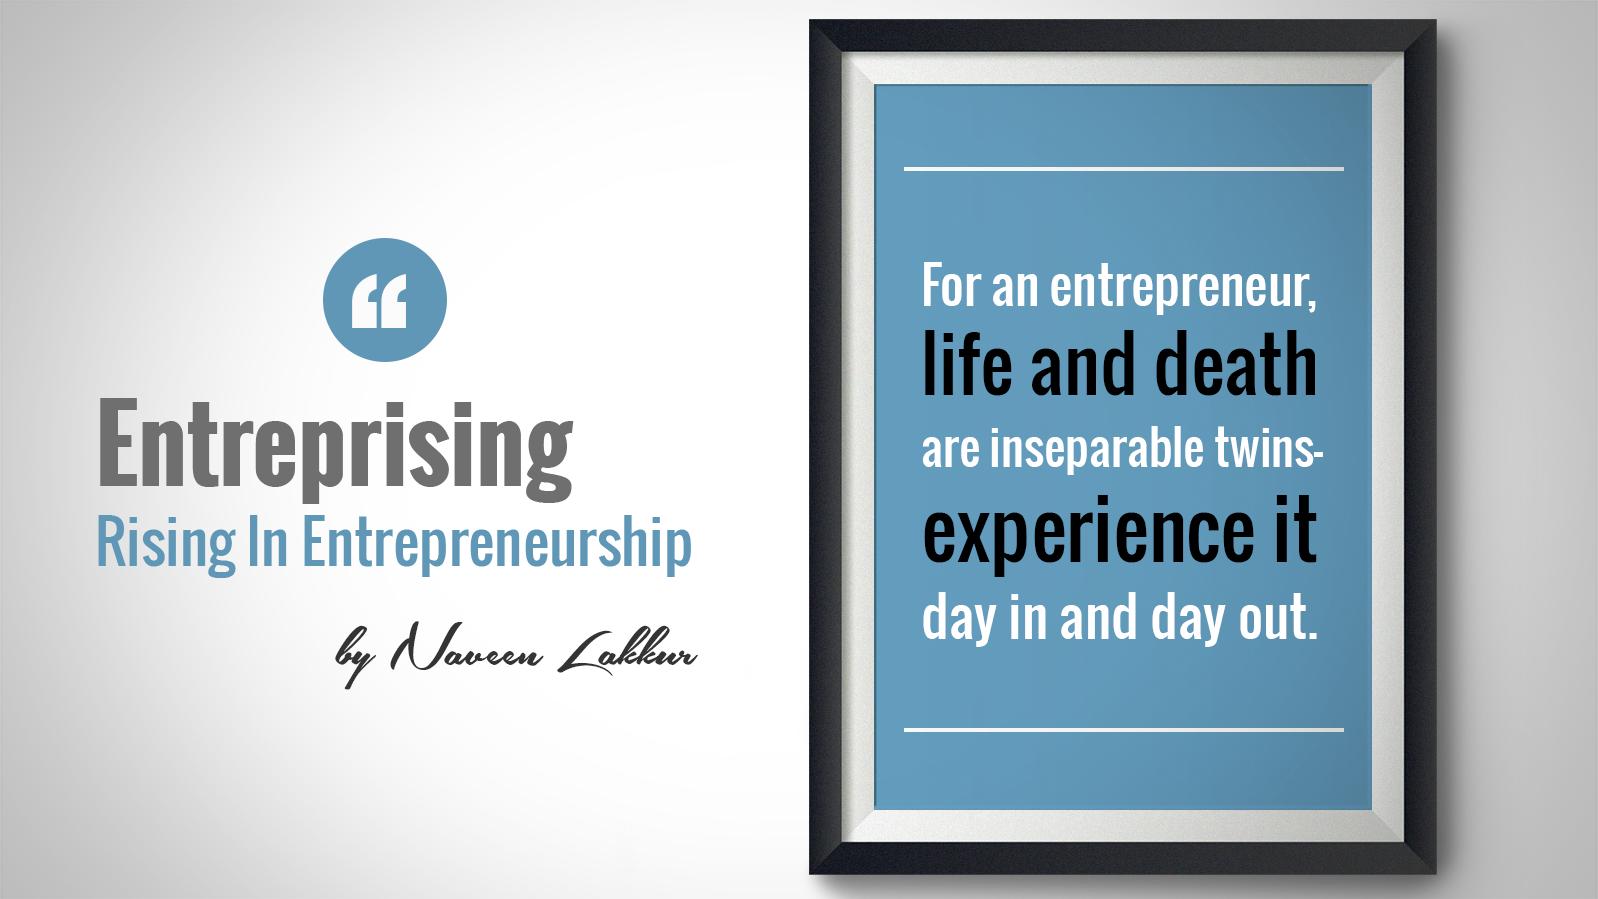 Entrepreneurship is made of failures